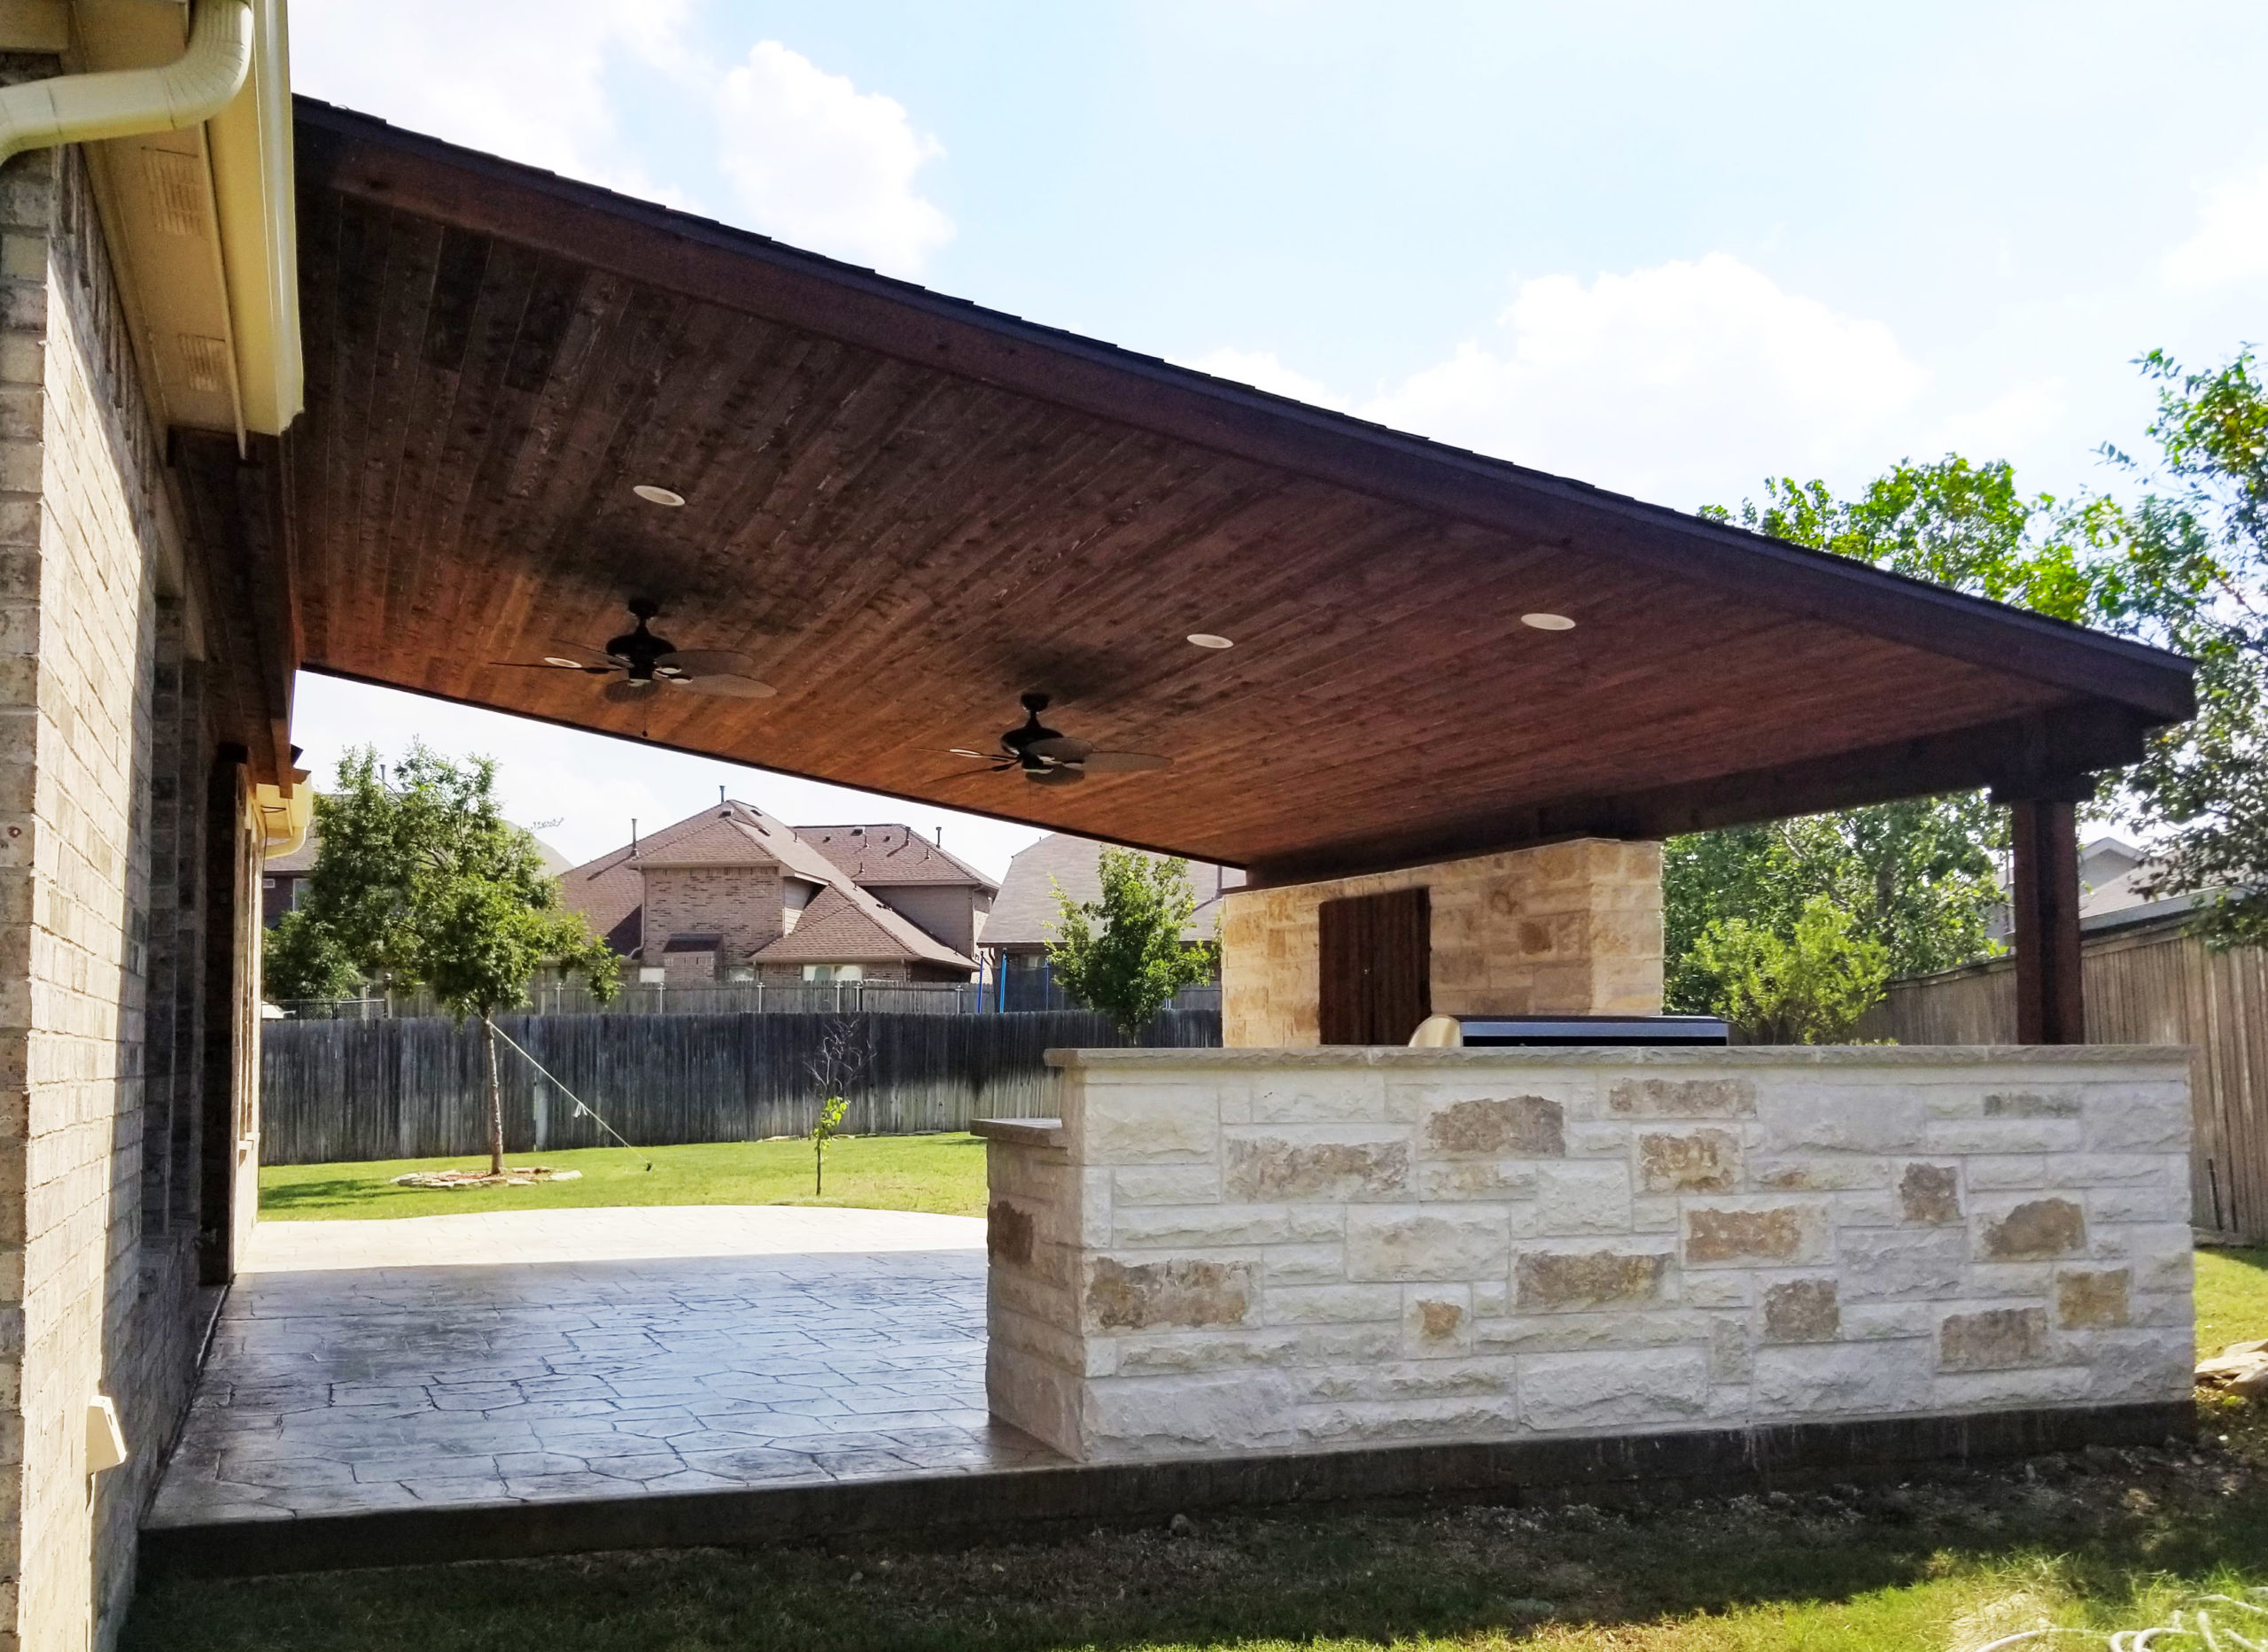 Frisco Patio Cover Companies   Beautiful Backyard Living ... on Backyard Patio Covers  id=40129